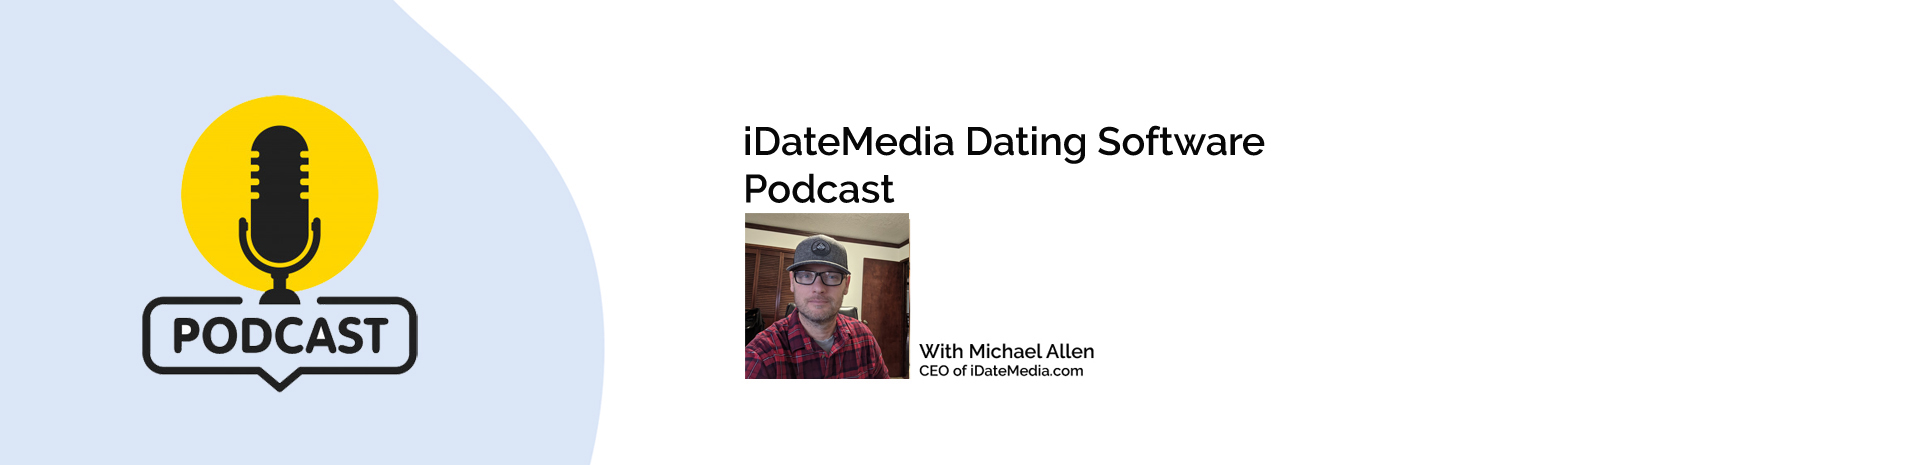 iDateMedia Dating Software Podcast